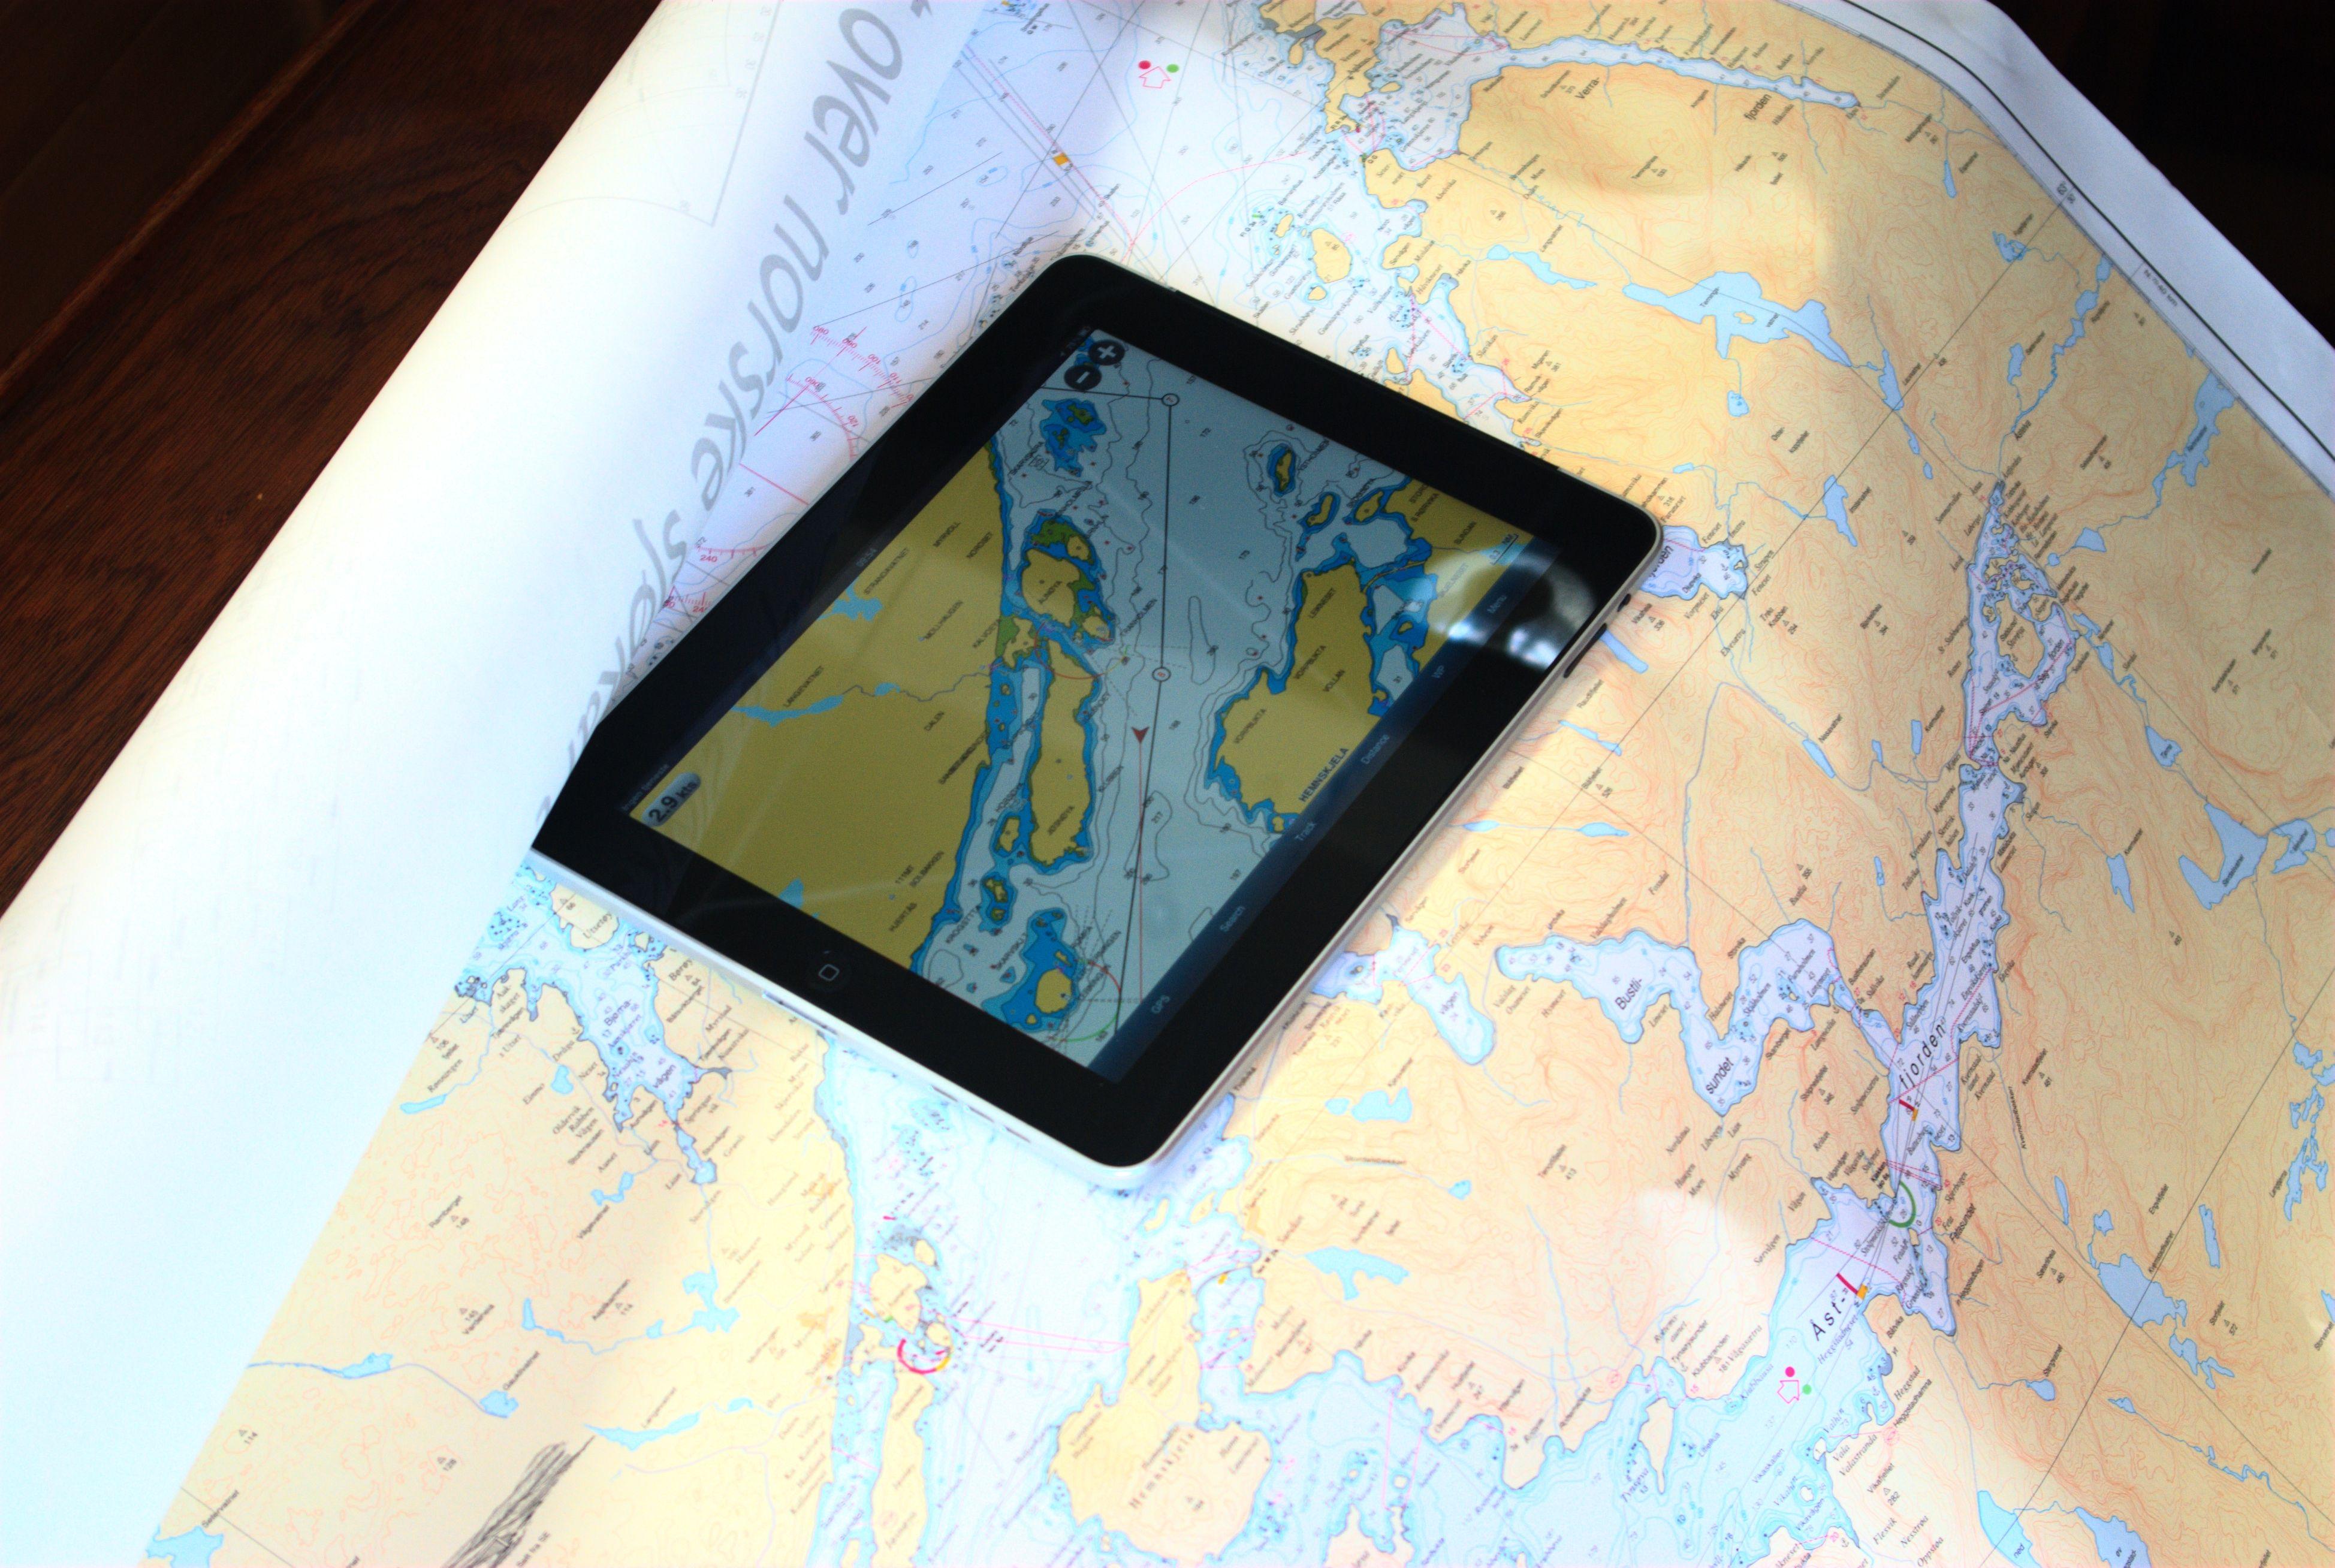 Kartet på iPad-en er prikk lik de gode gamle papirsjøkartene.